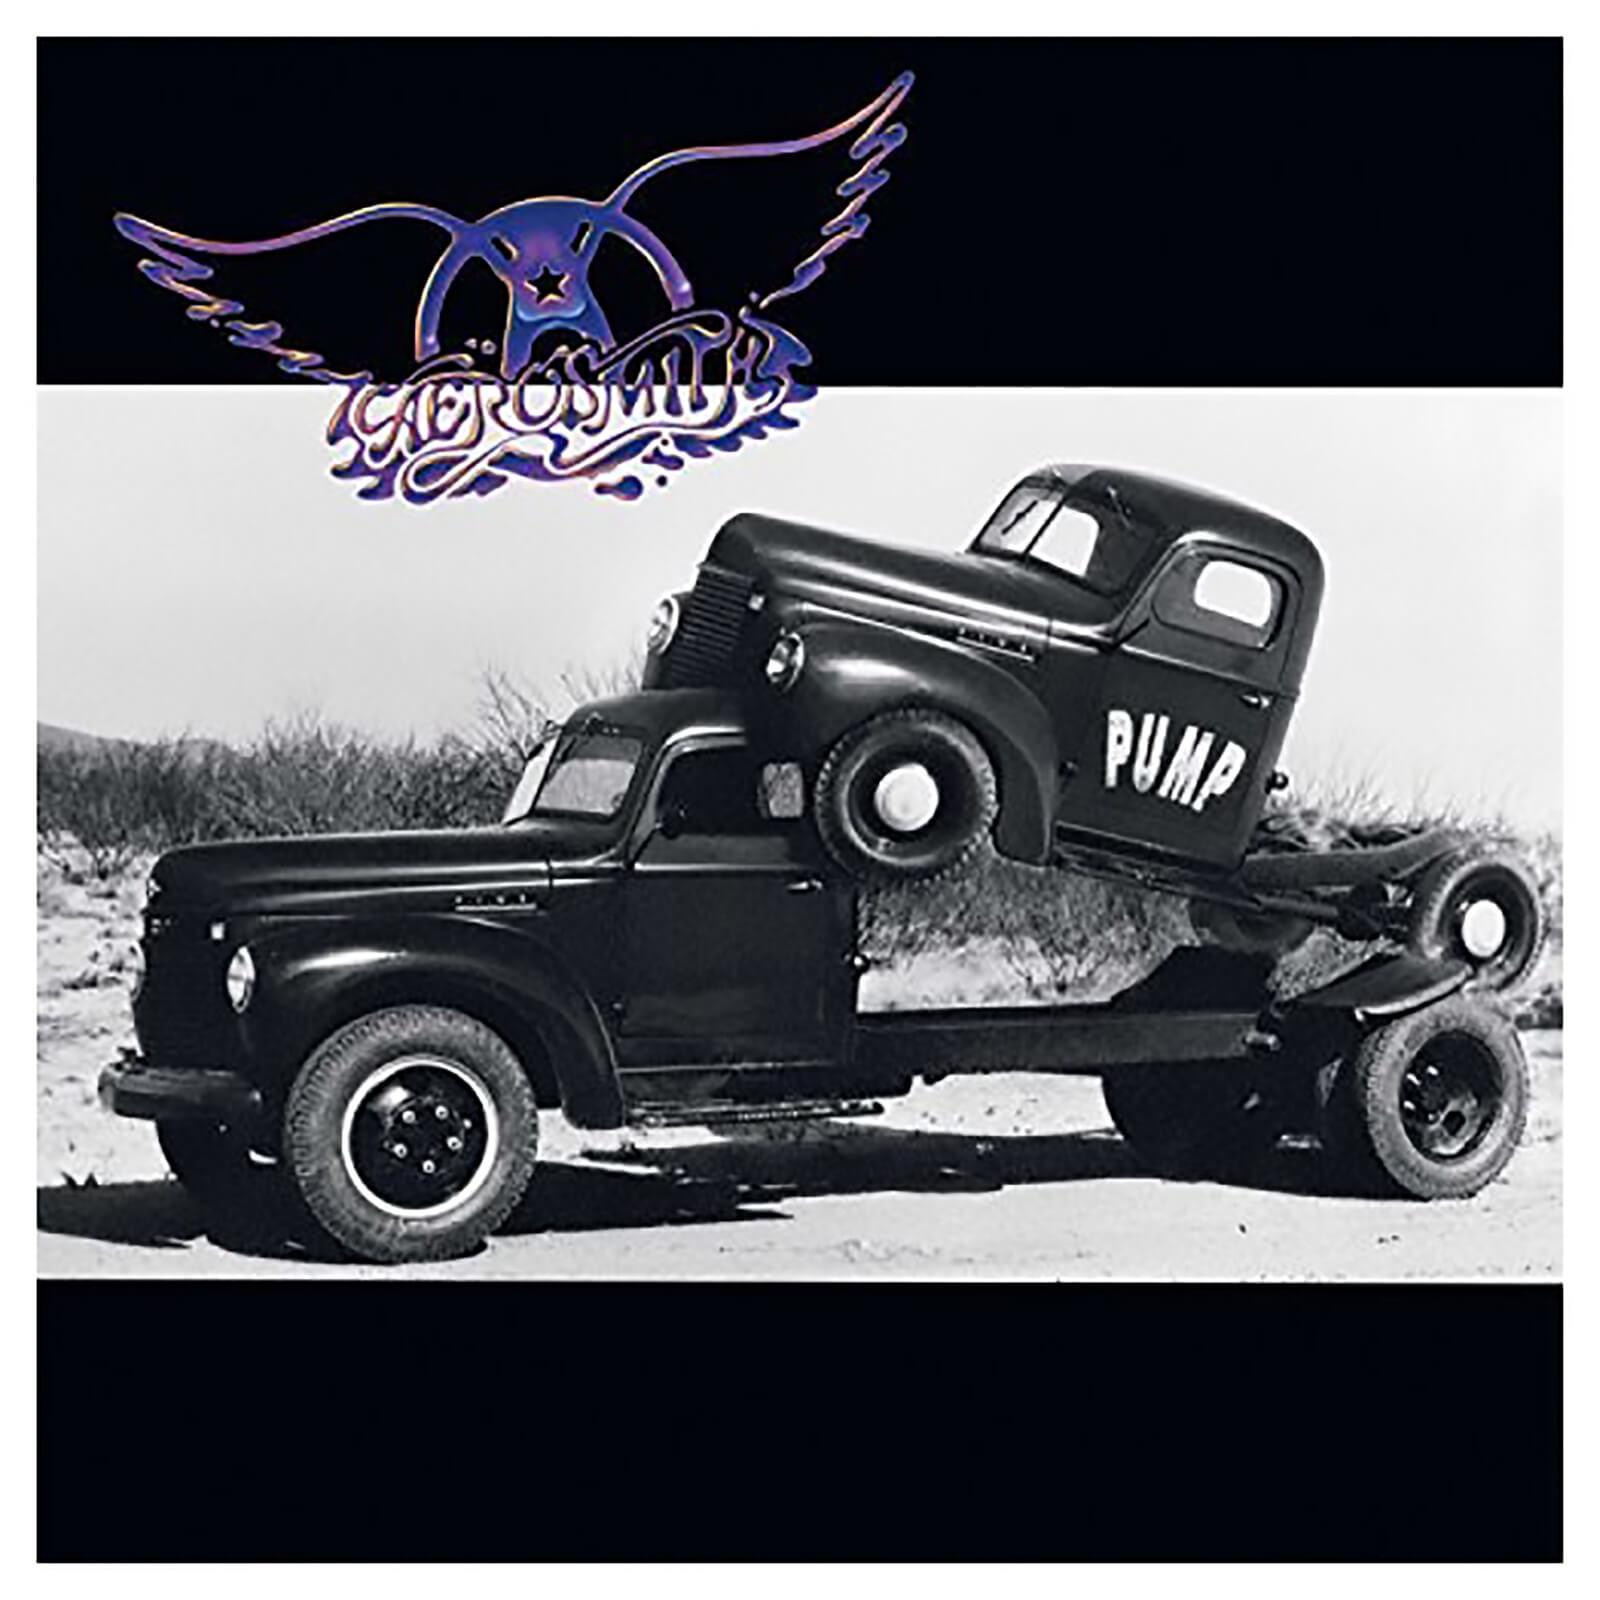 Hard Rock 86/90 - Página 25 11744940-7764574457904506